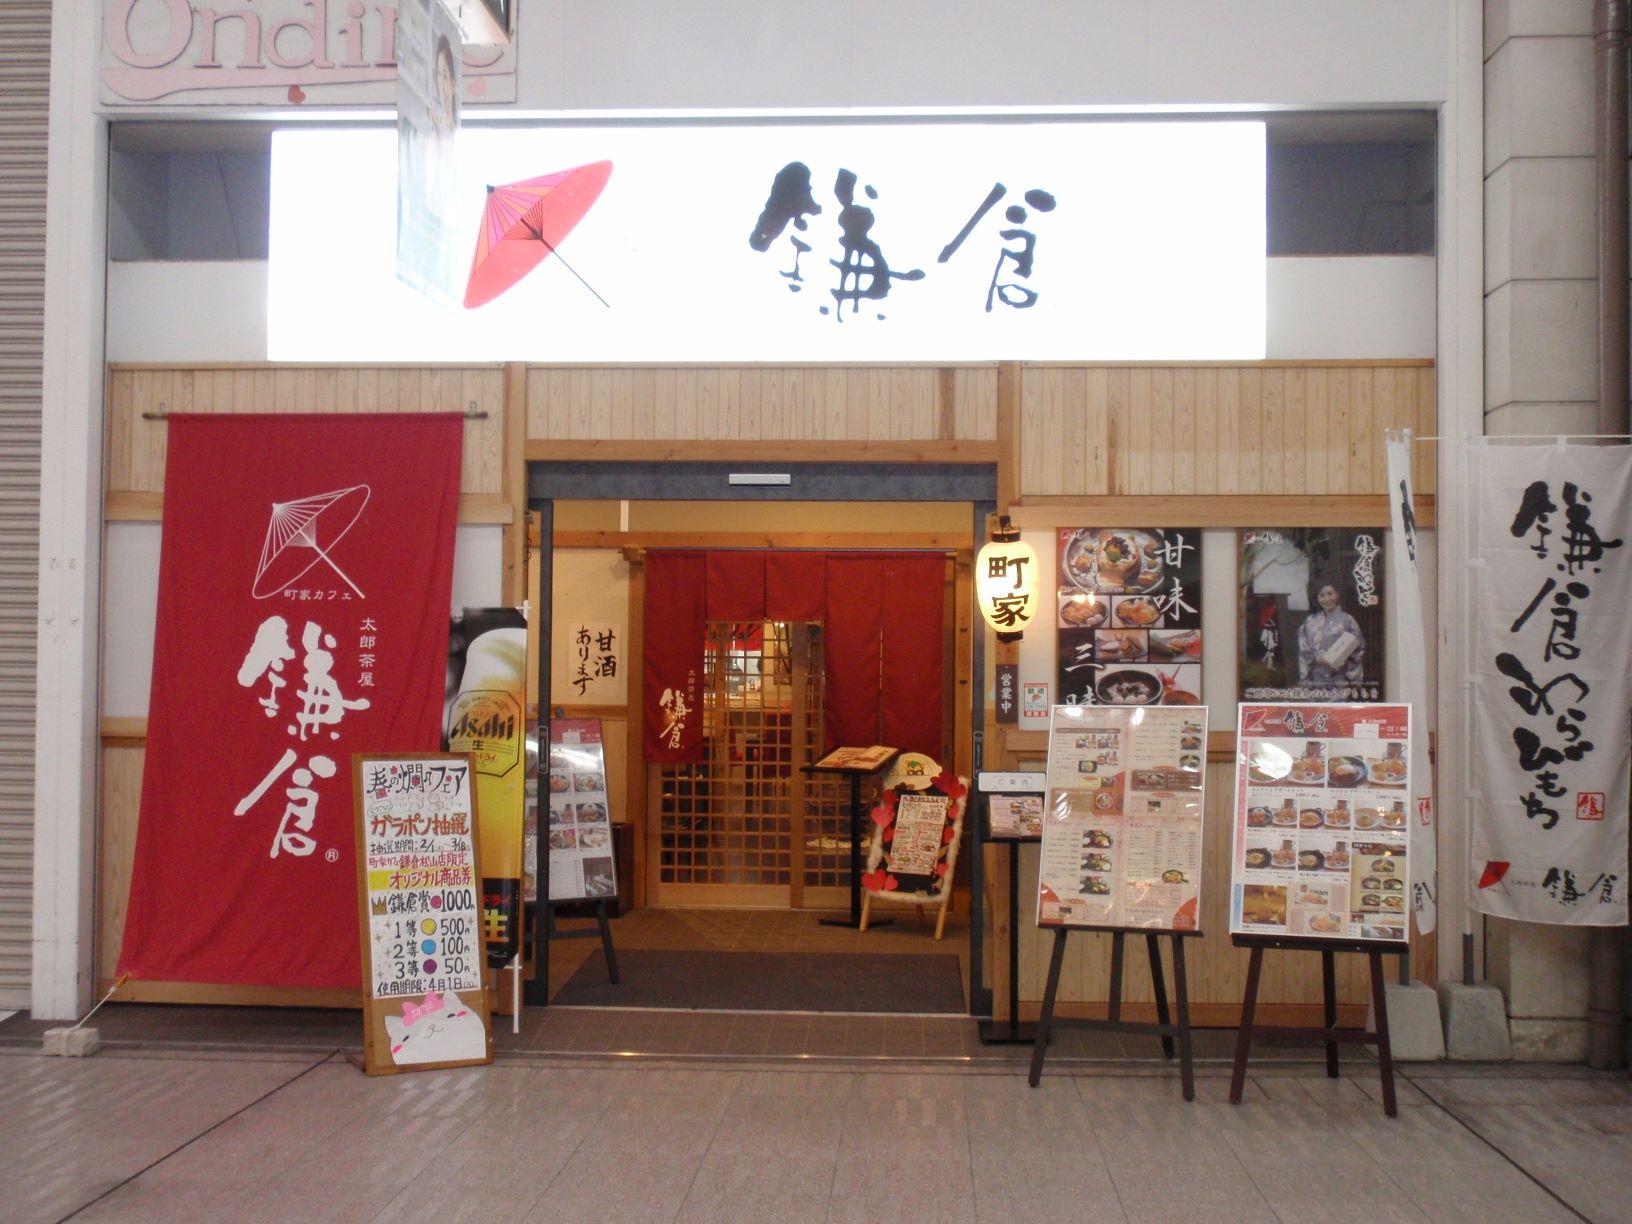 【Vol.33掲載 町家カフェ 太郎茶屋鎌倉 松山店様よりお知らせ】